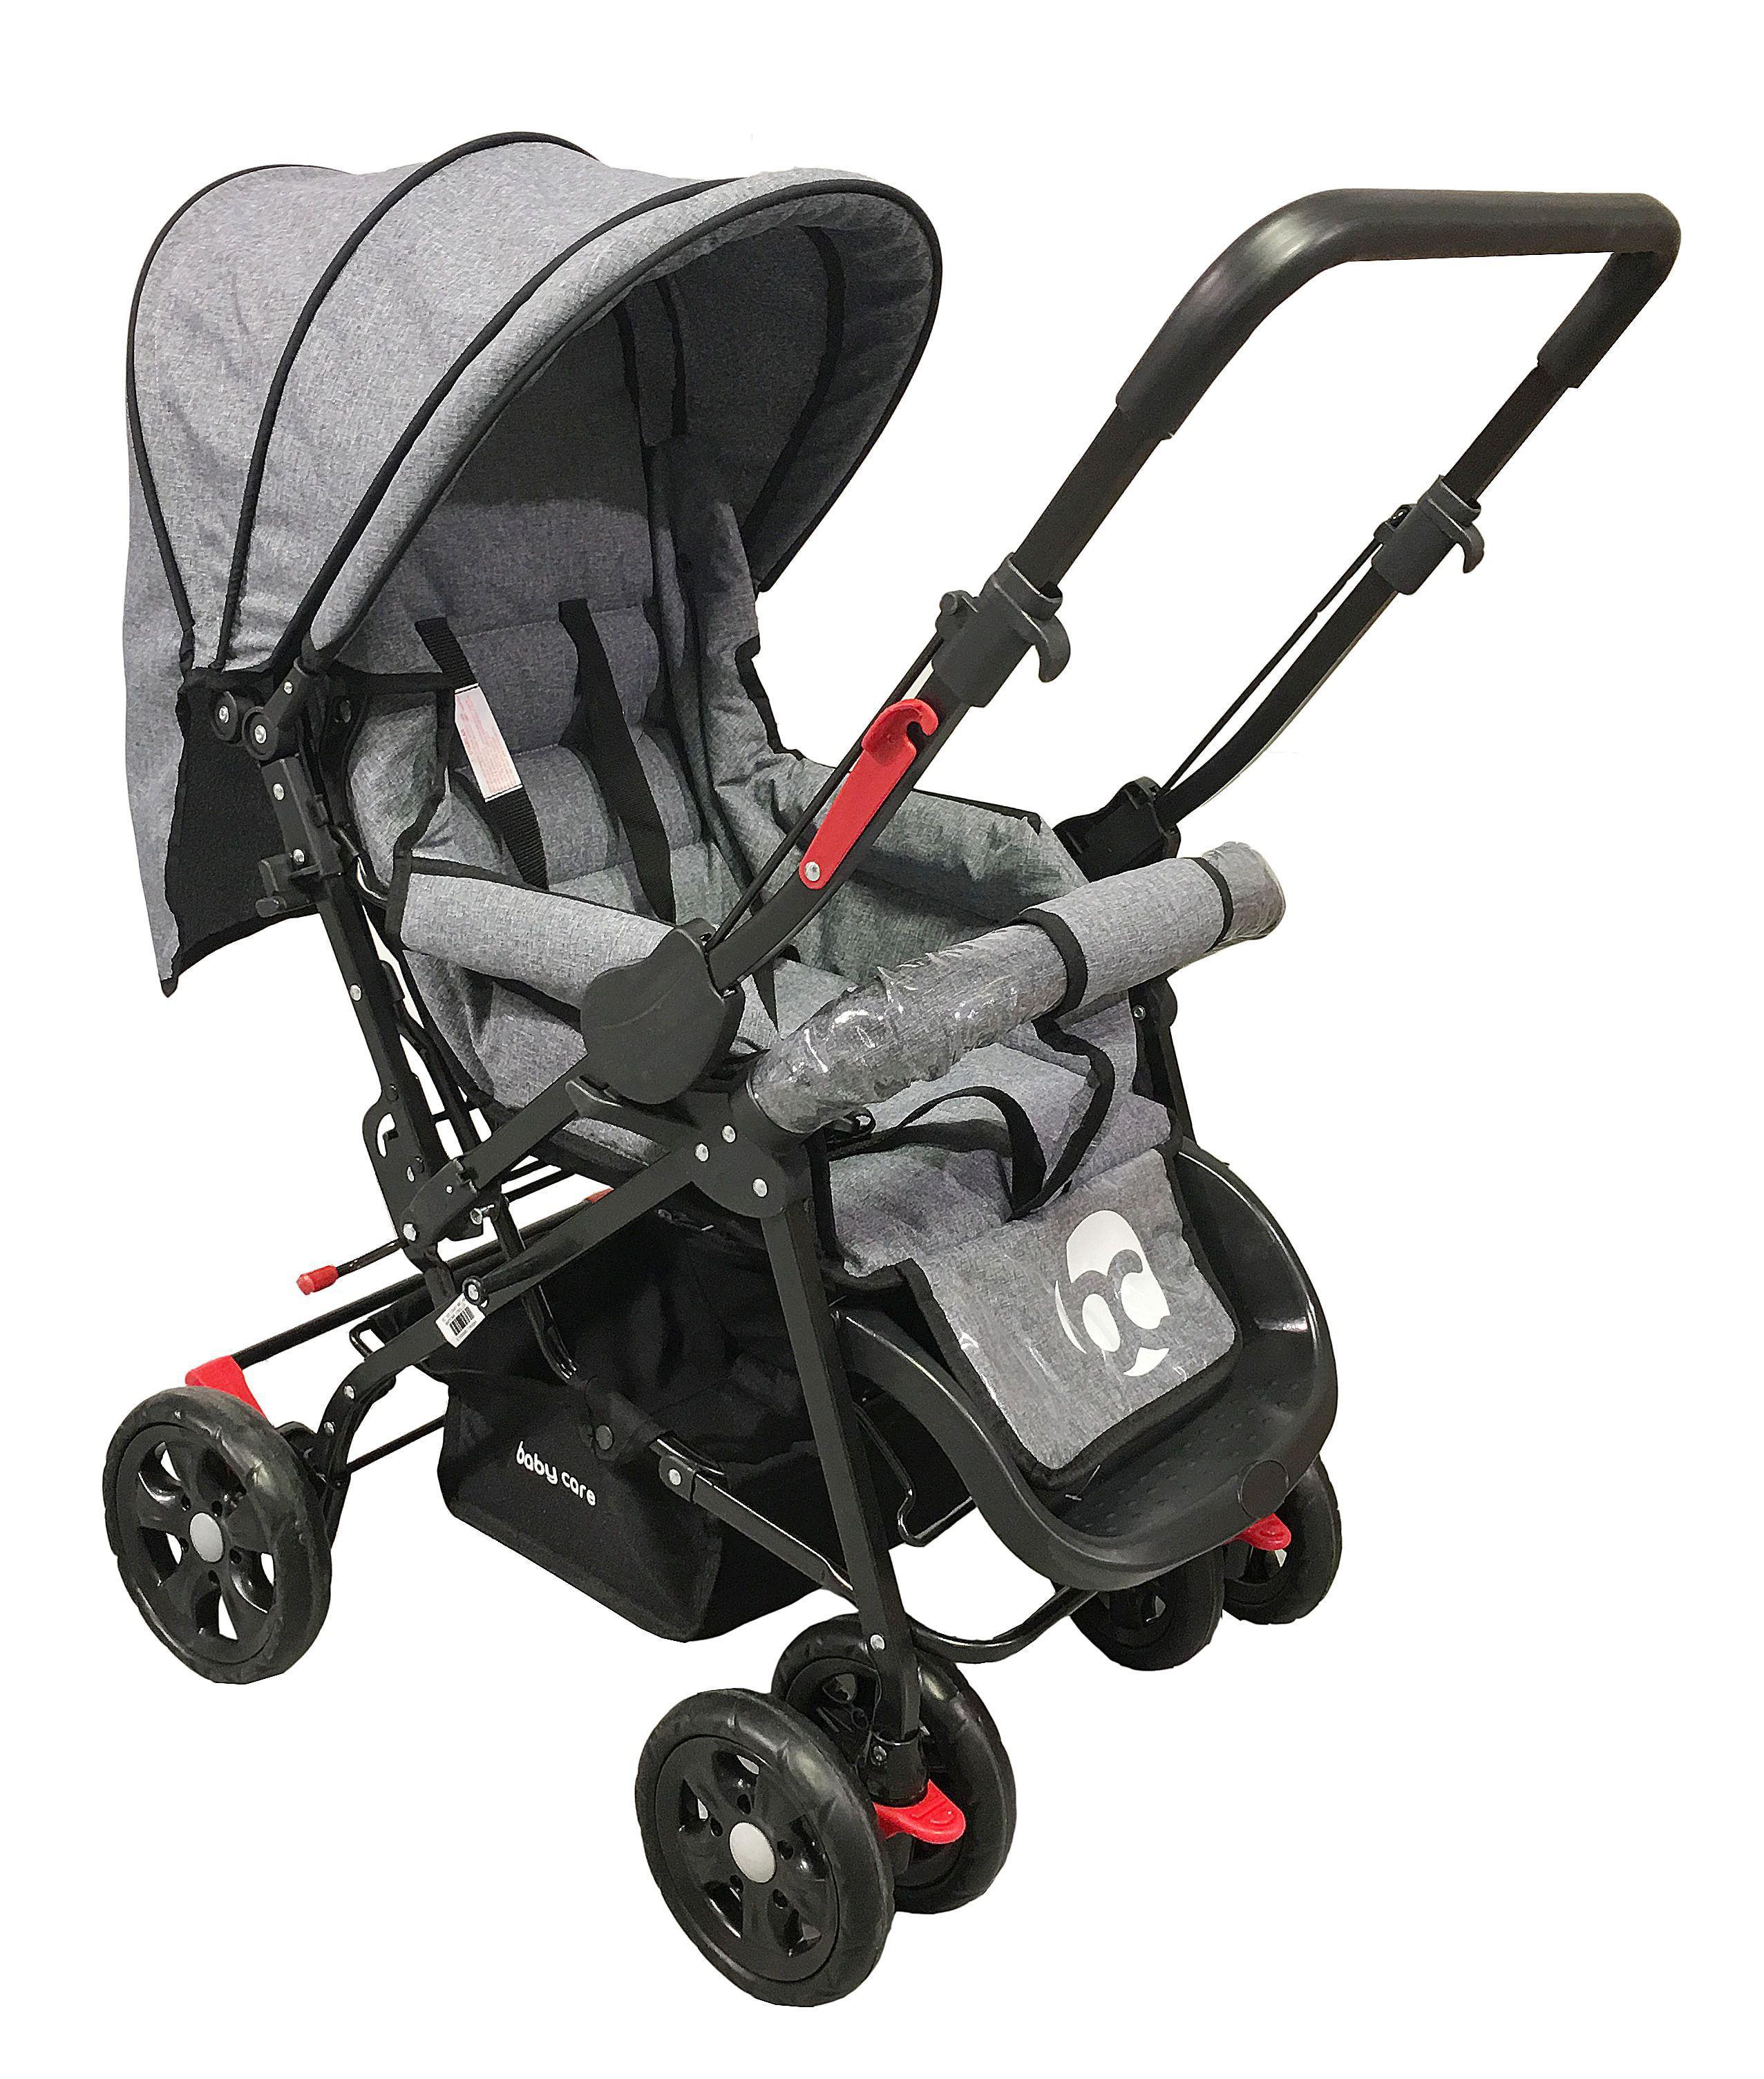 Image of Kinderwagen Babycare Snopy Grey Melange 23776